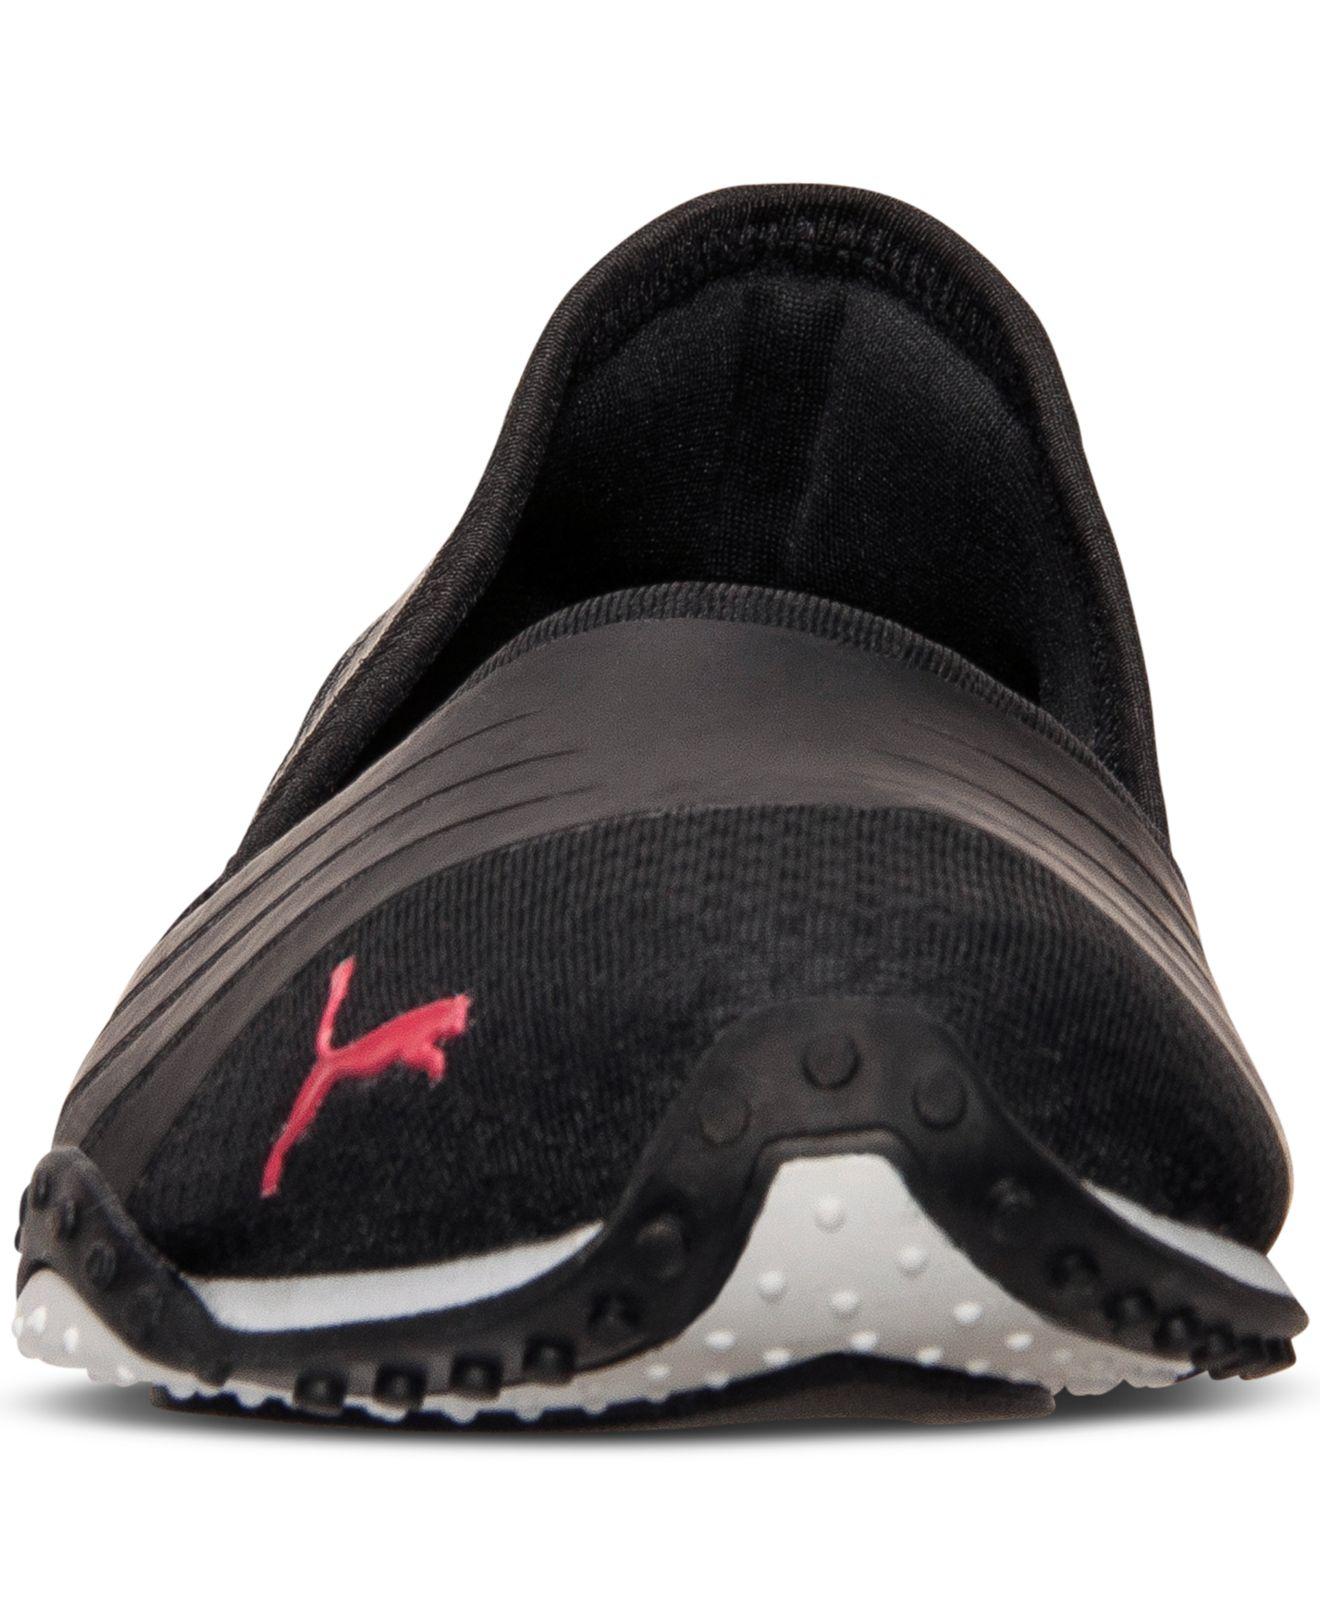 53db89a08fb Lyst - PUMA Women s Asha Alt 2 Casual Sneakers From Finish Line in Black